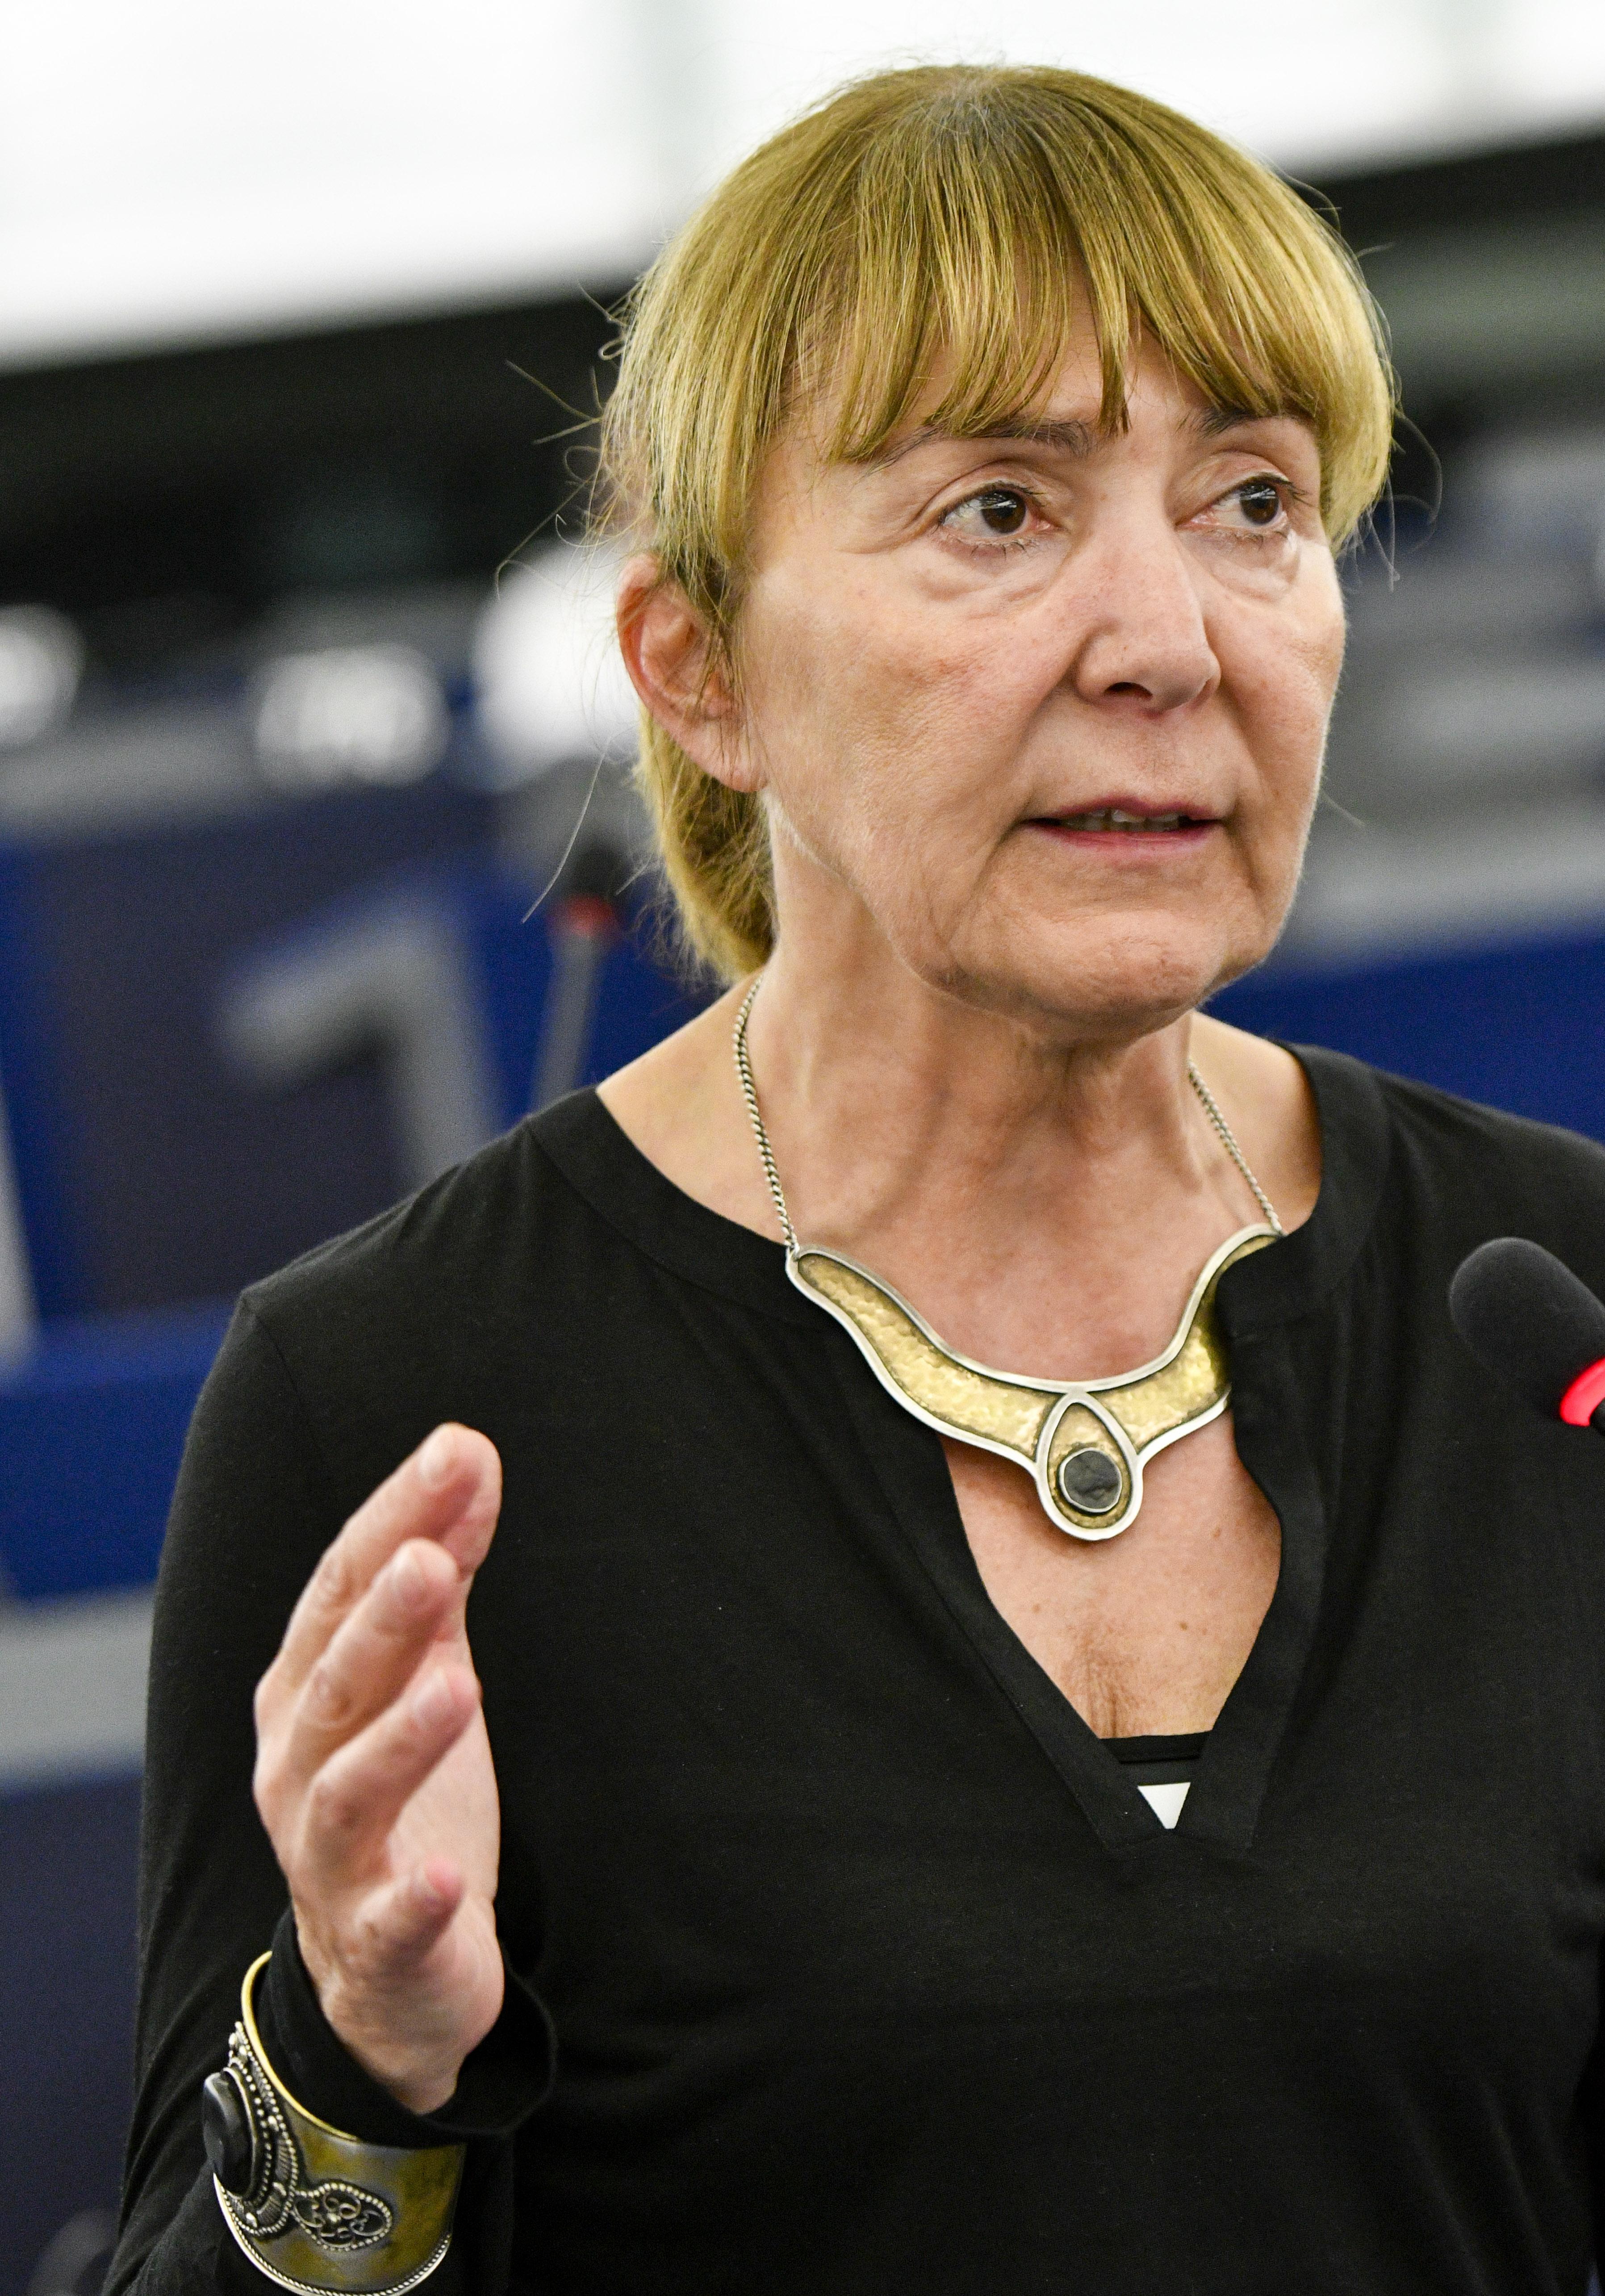 Monica Macovei: Justice in Malta still undermined by corruption